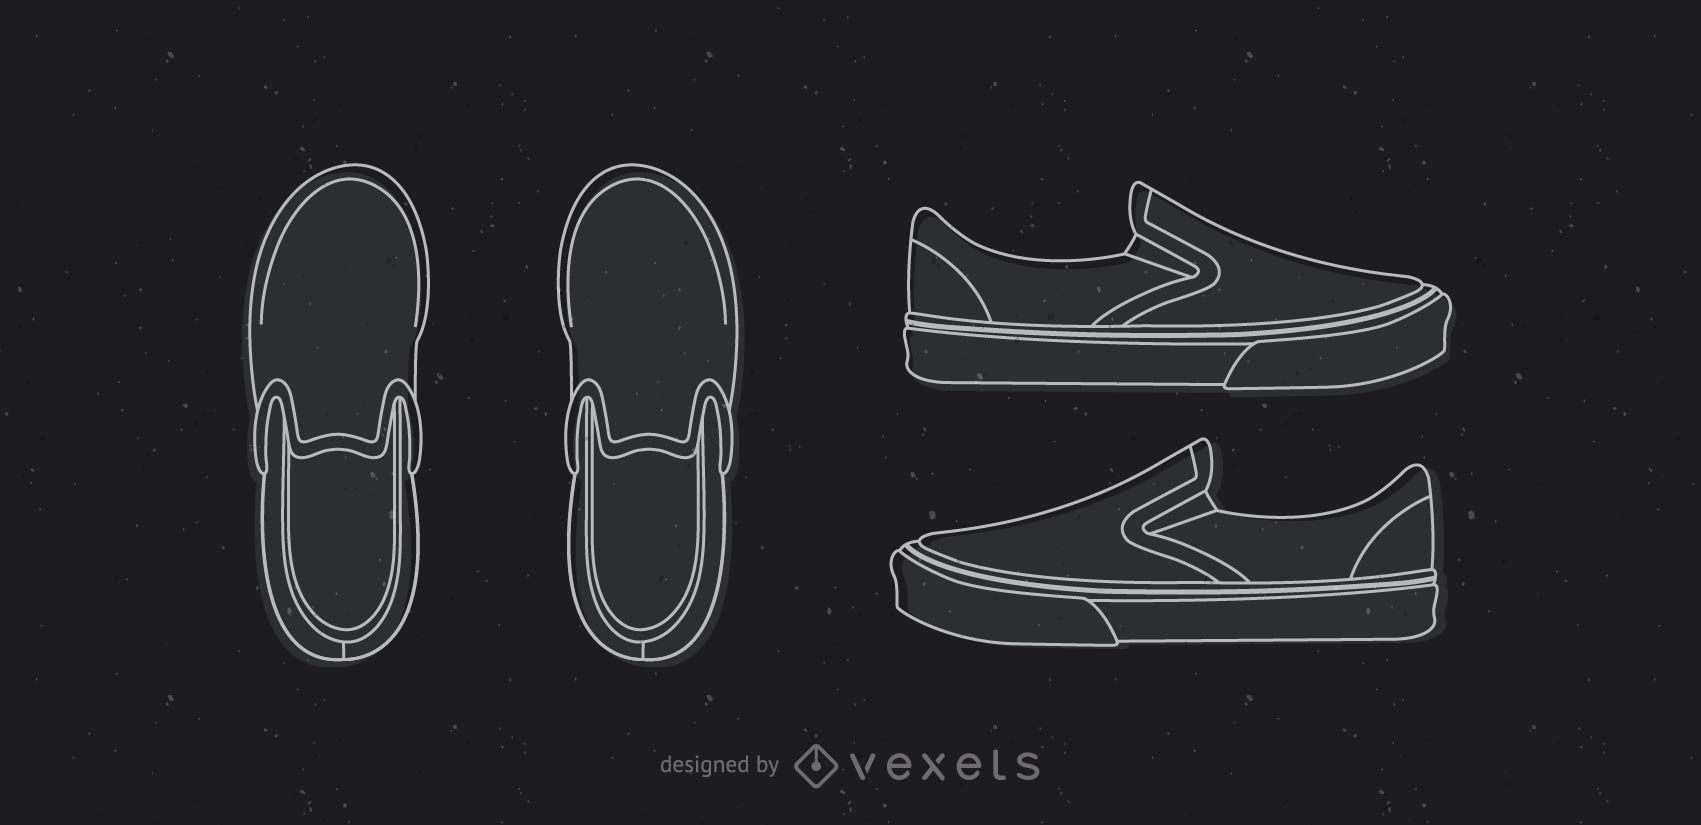 vans classic template shoe vector download. Black Bedroom Furniture Sets. Home Design Ideas